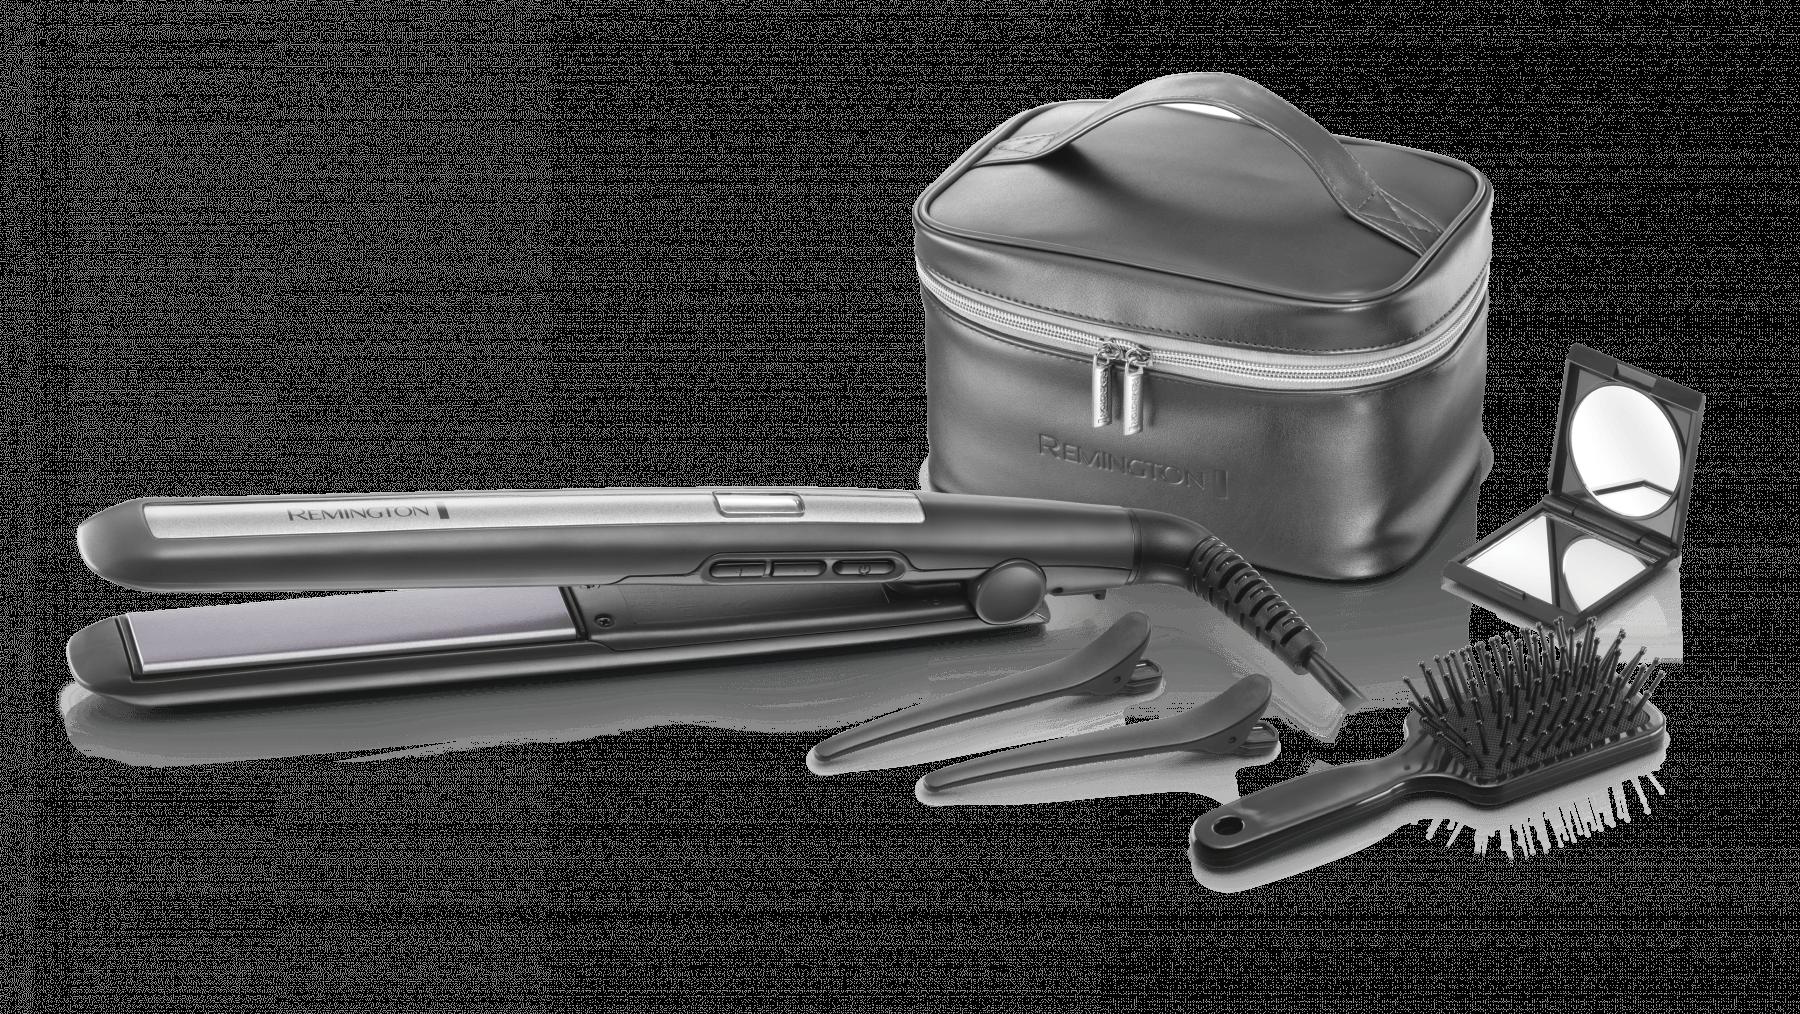 Prostownica Remington Pro-Ceramic Titanium S5506GP + akcesoria